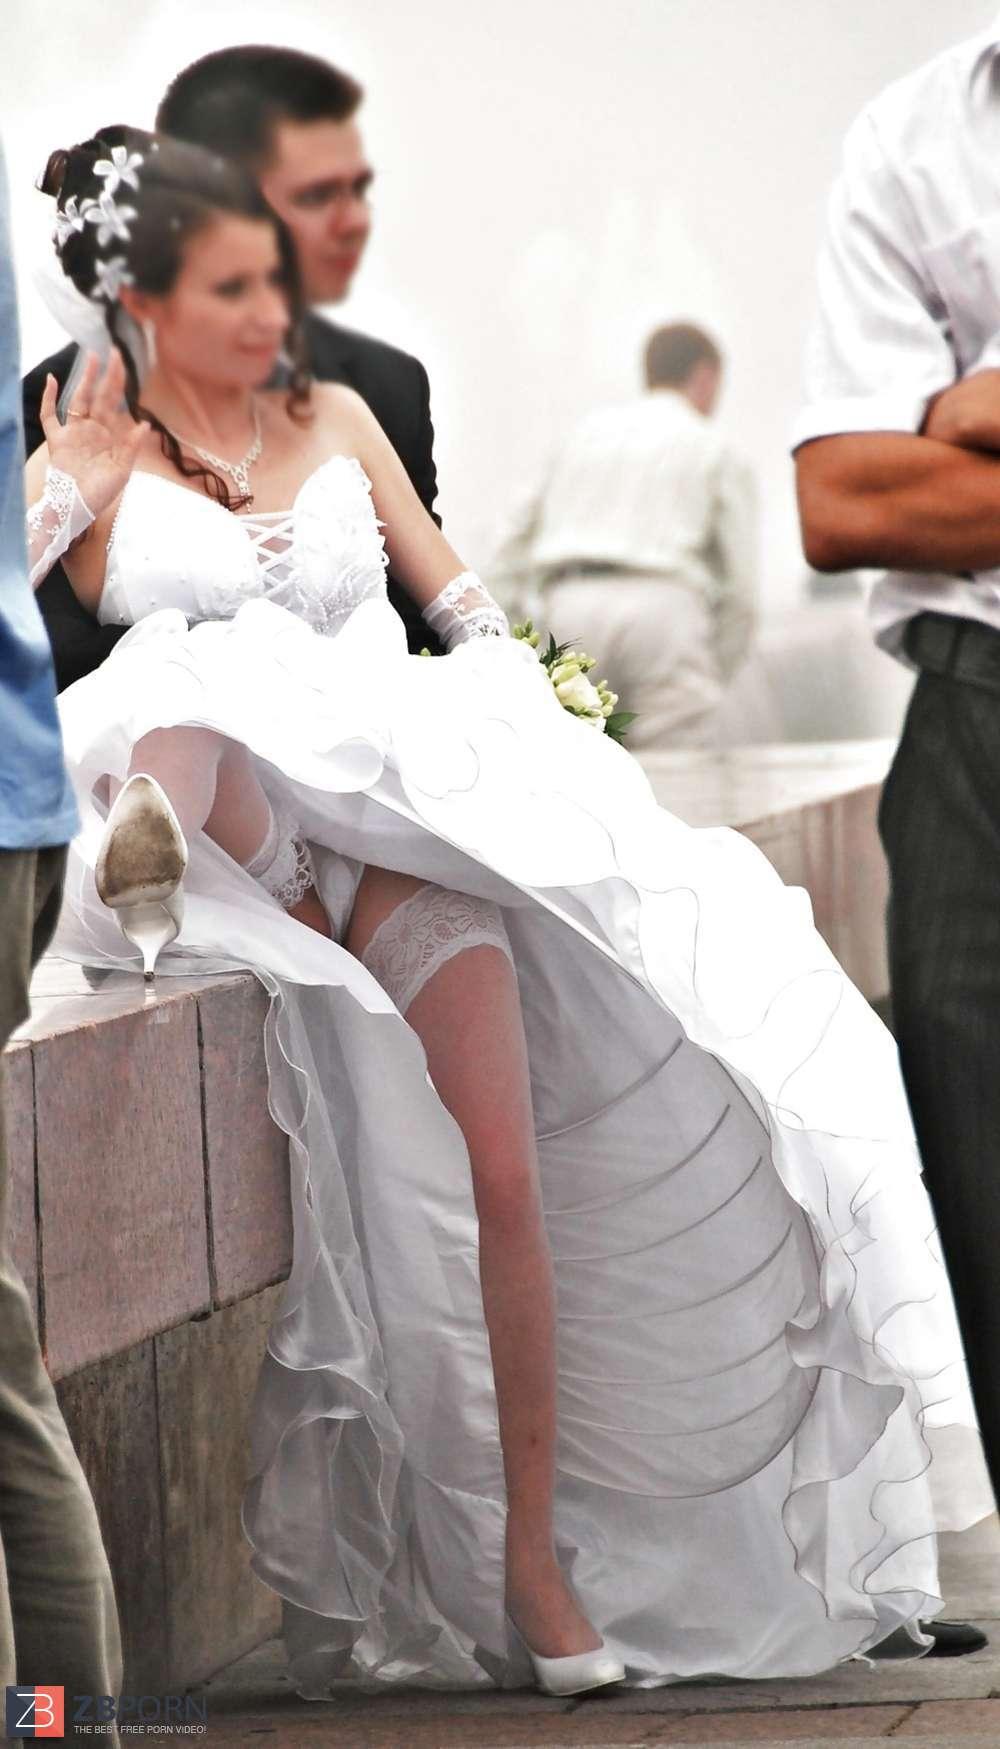 Bride wedding voyeur oops